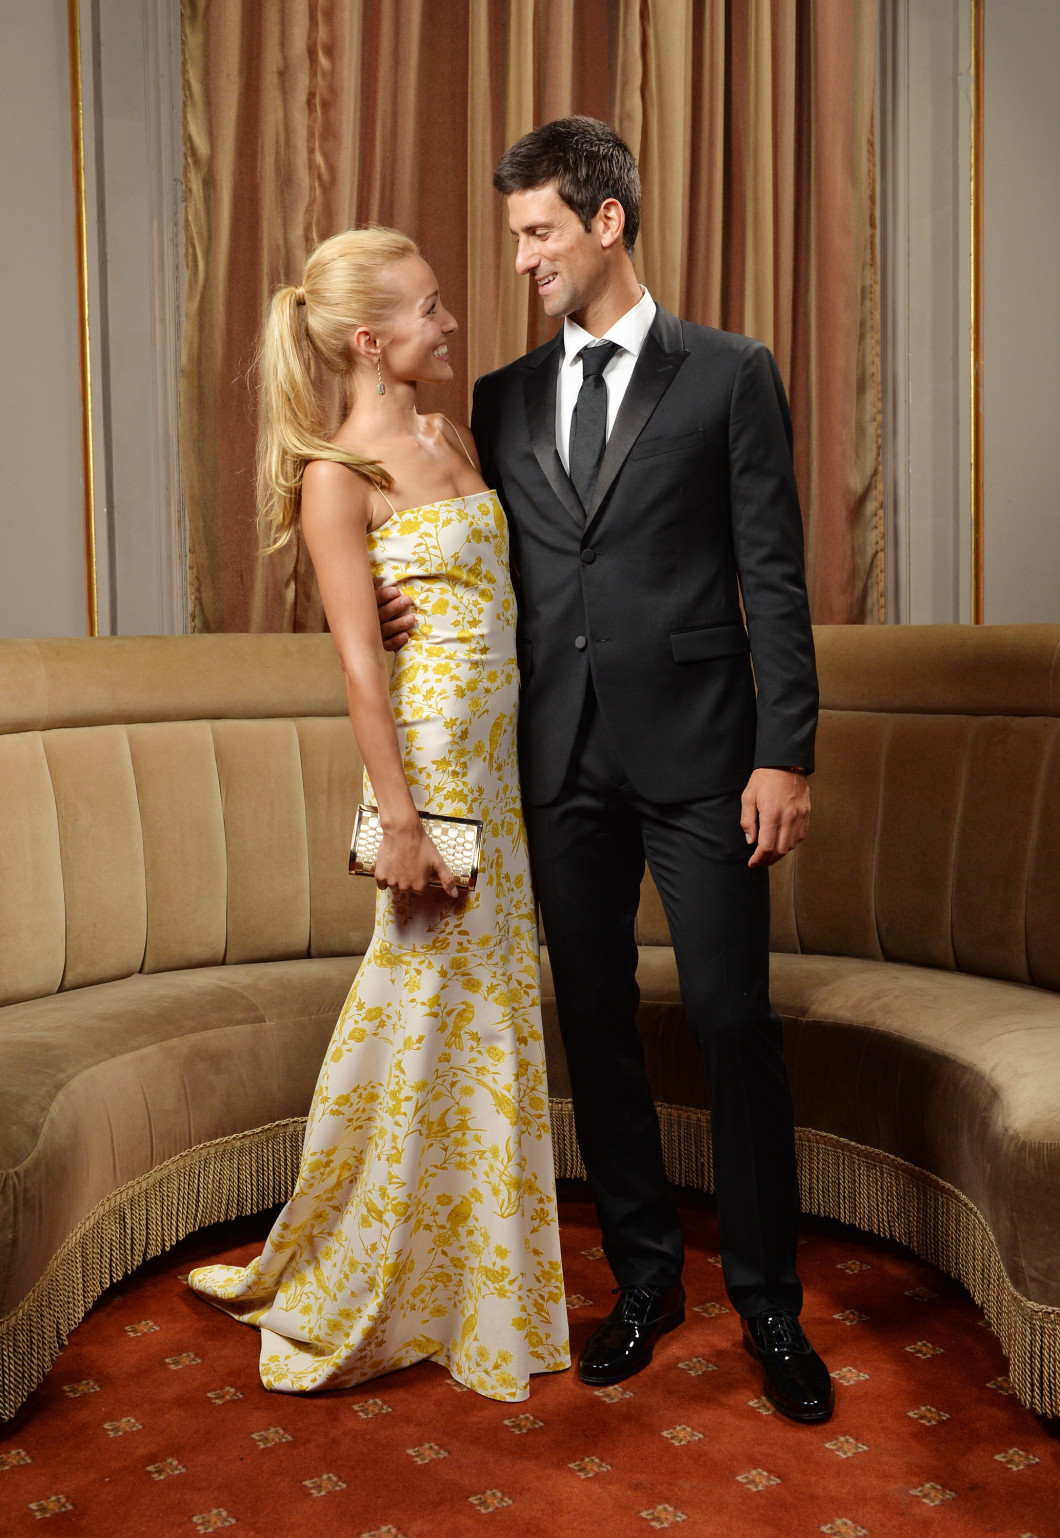 The Novak Djokovic Foundation New York Dinner - Portraits